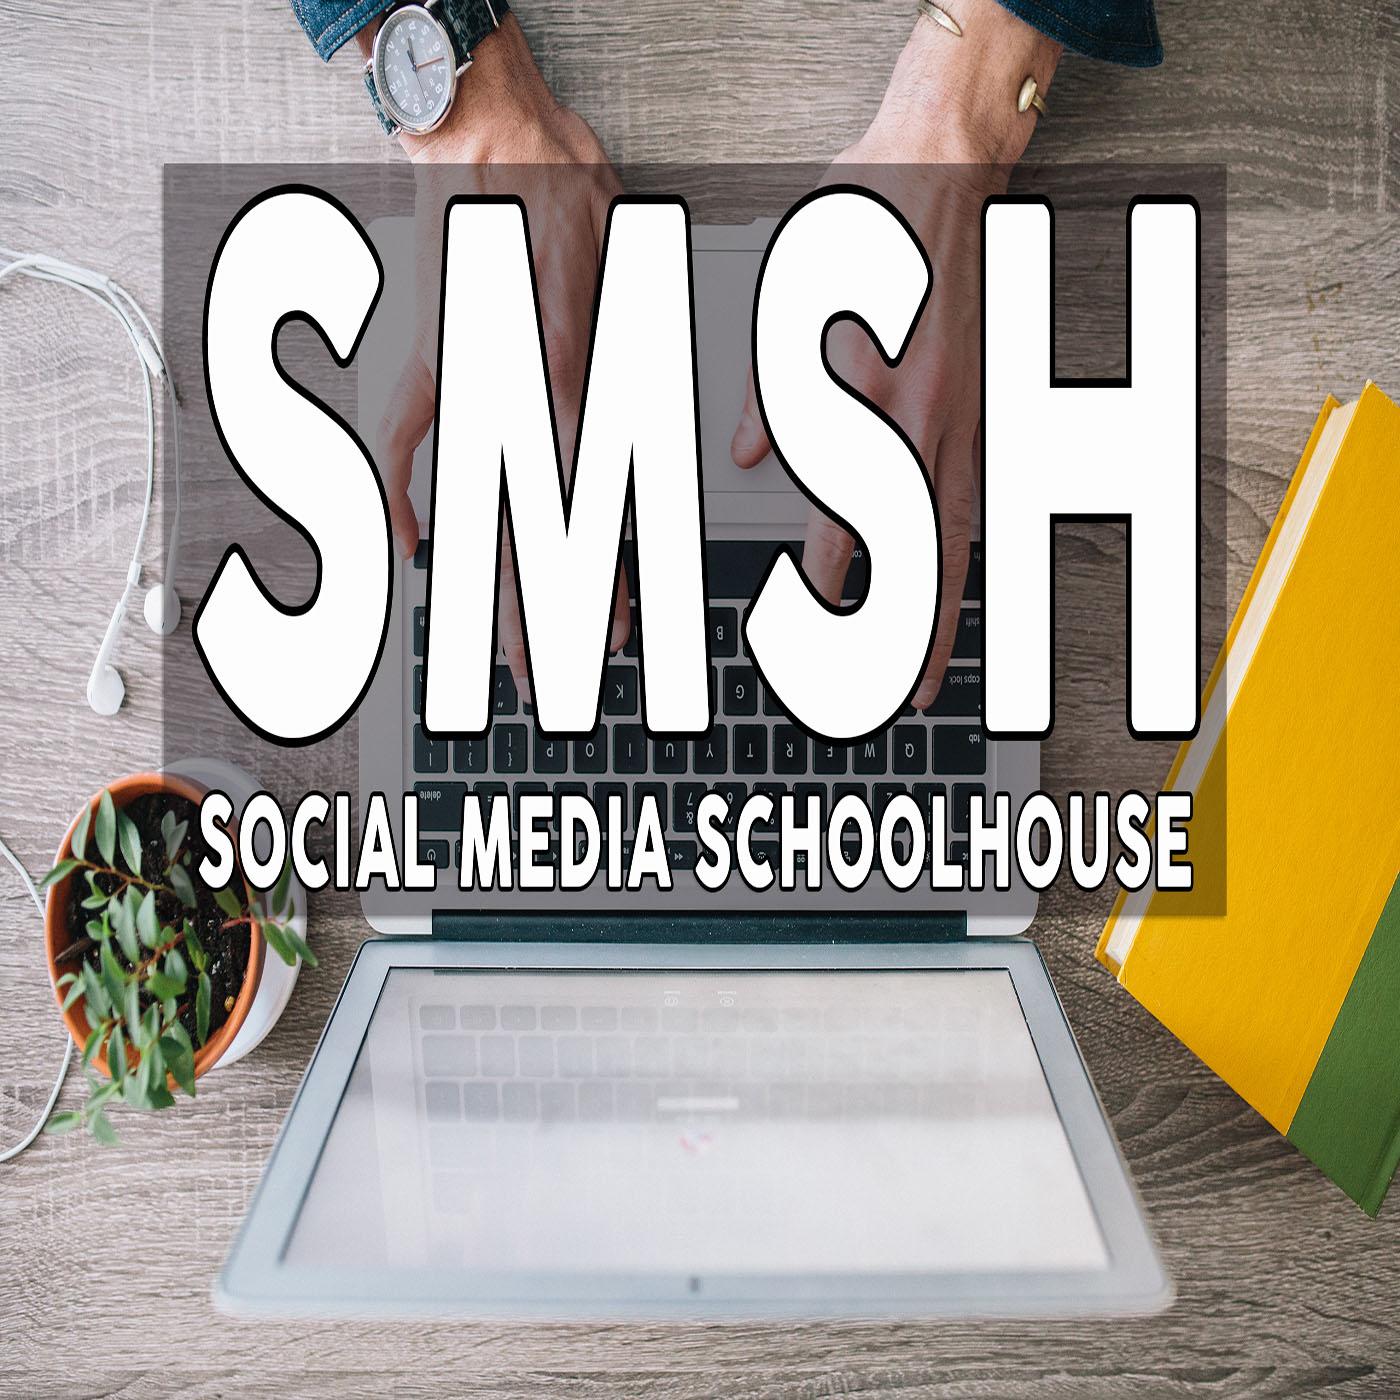 Social Media Schoolhouse